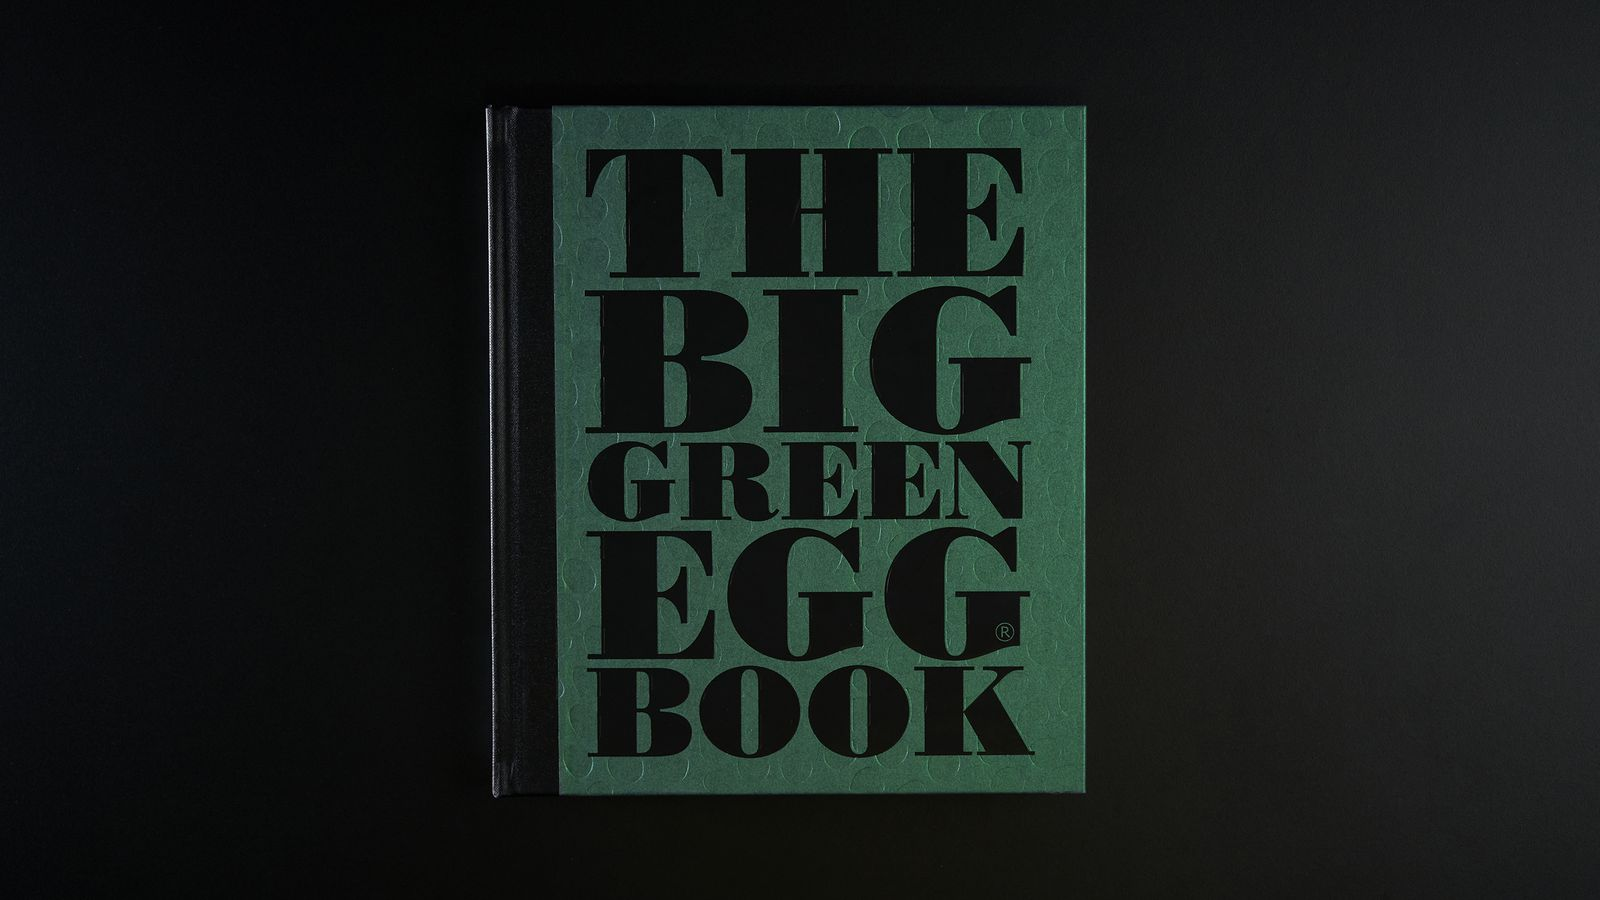 The Big Green Egg book - Cover.jpg